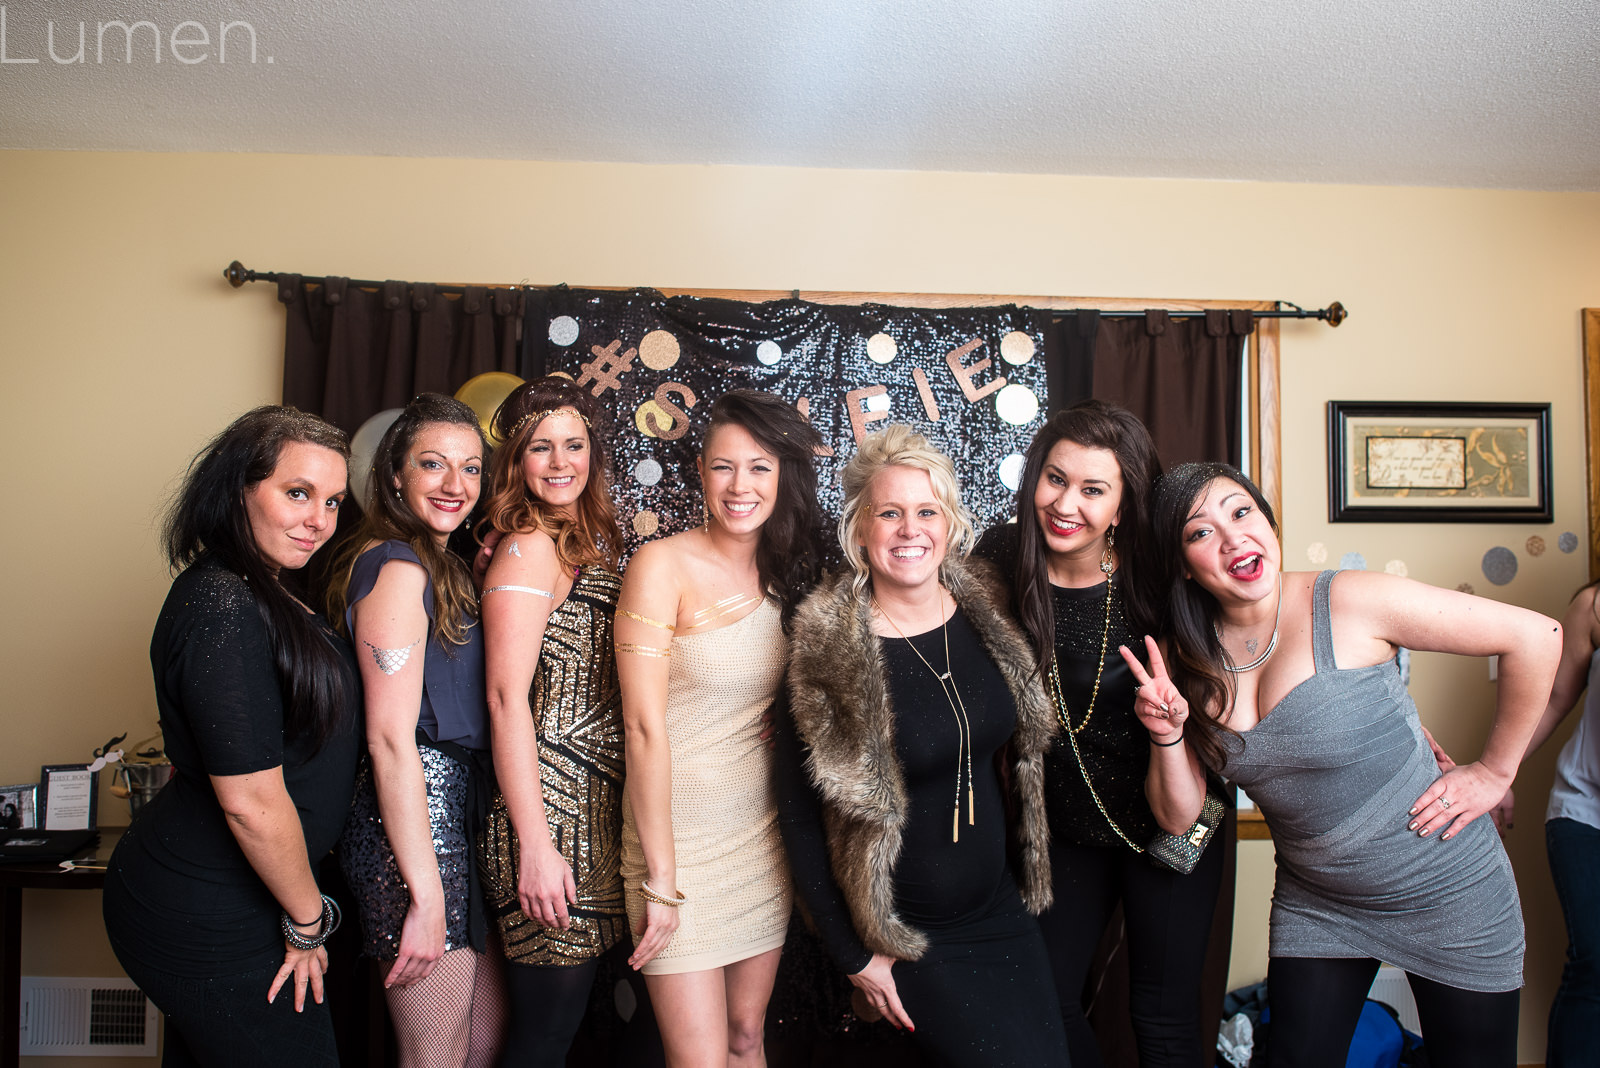 Minneapolis Bachelorette Party Ideas Photo Session Lumen